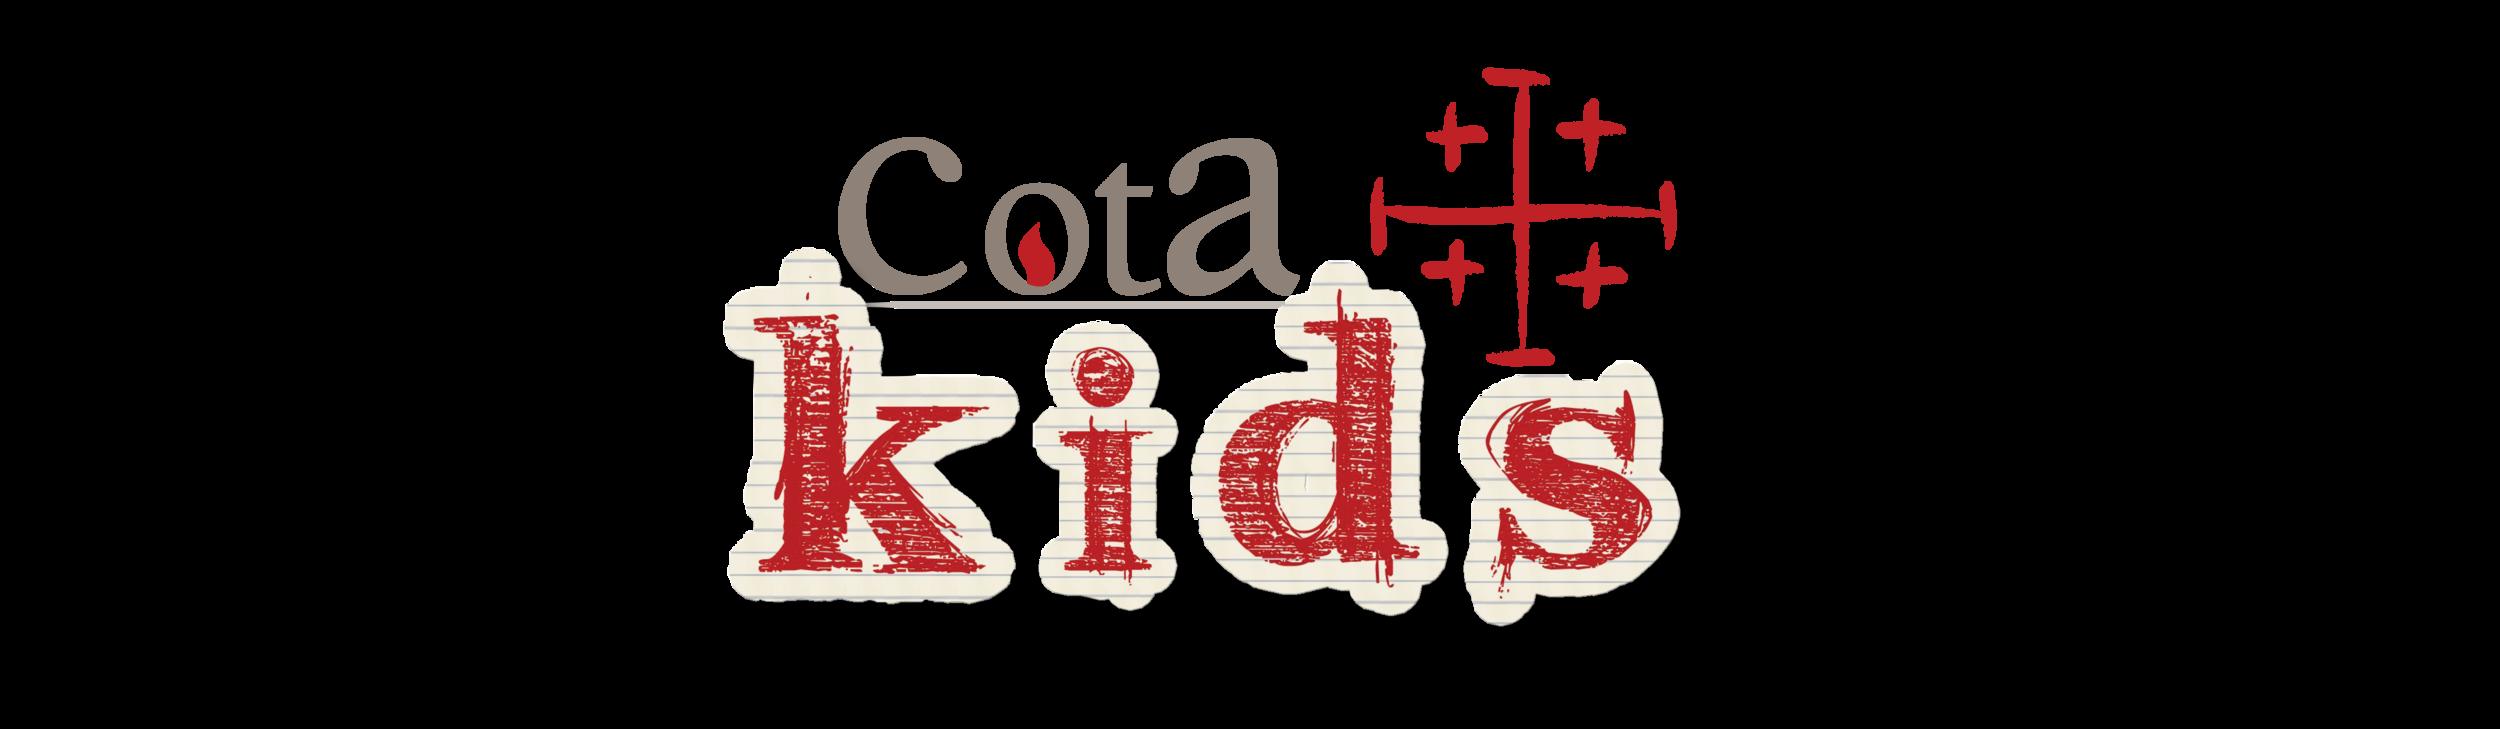 CotaKids Logo Banner.png